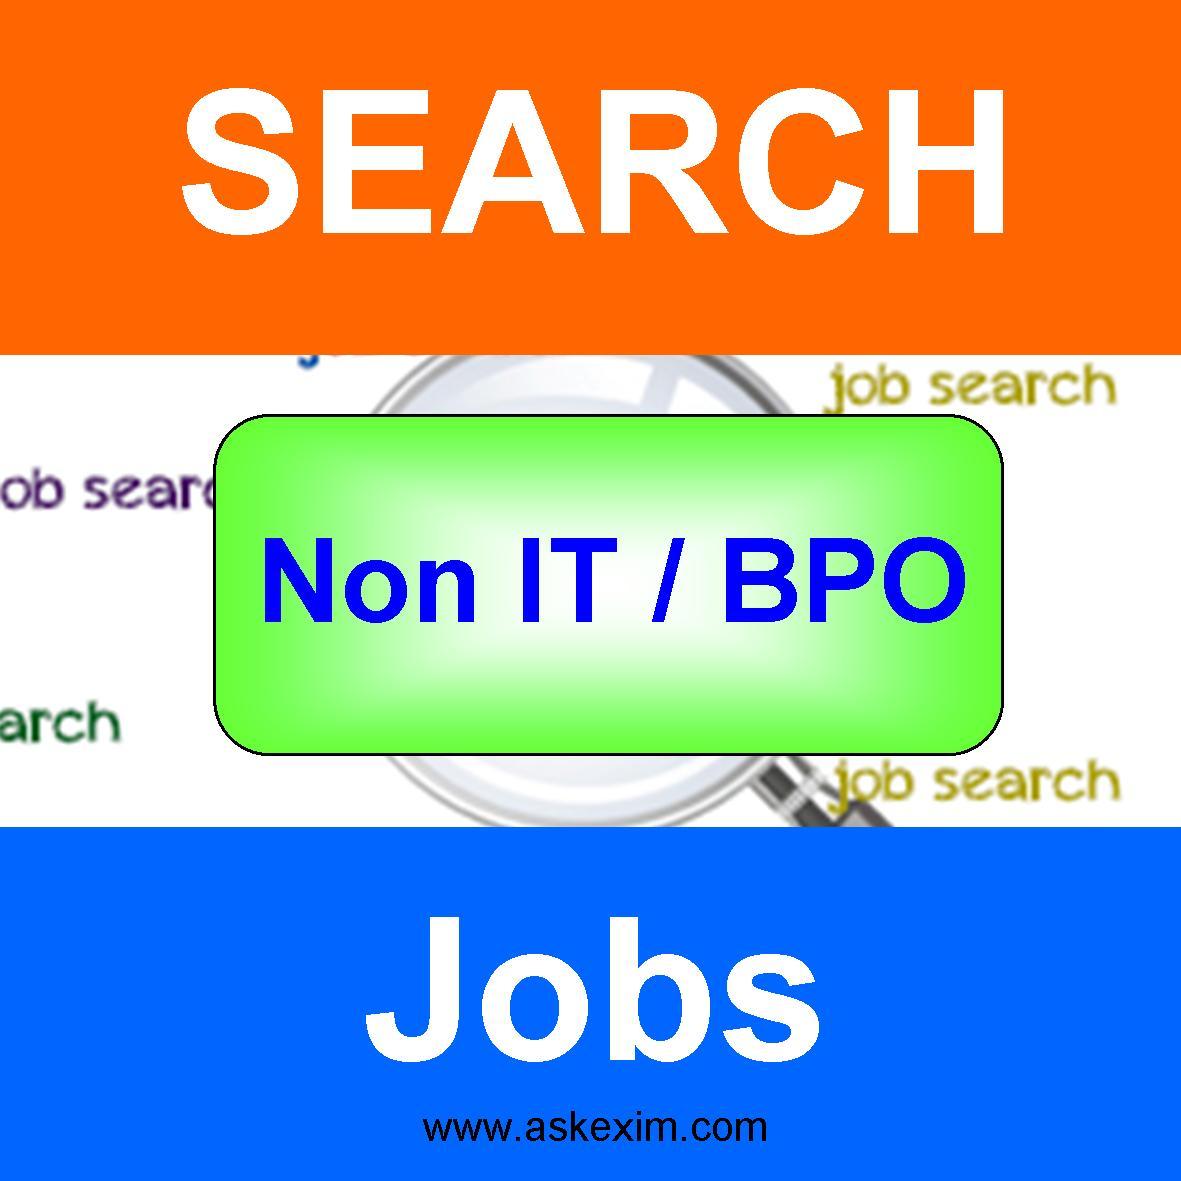 Search Non IT / BPO Jobs